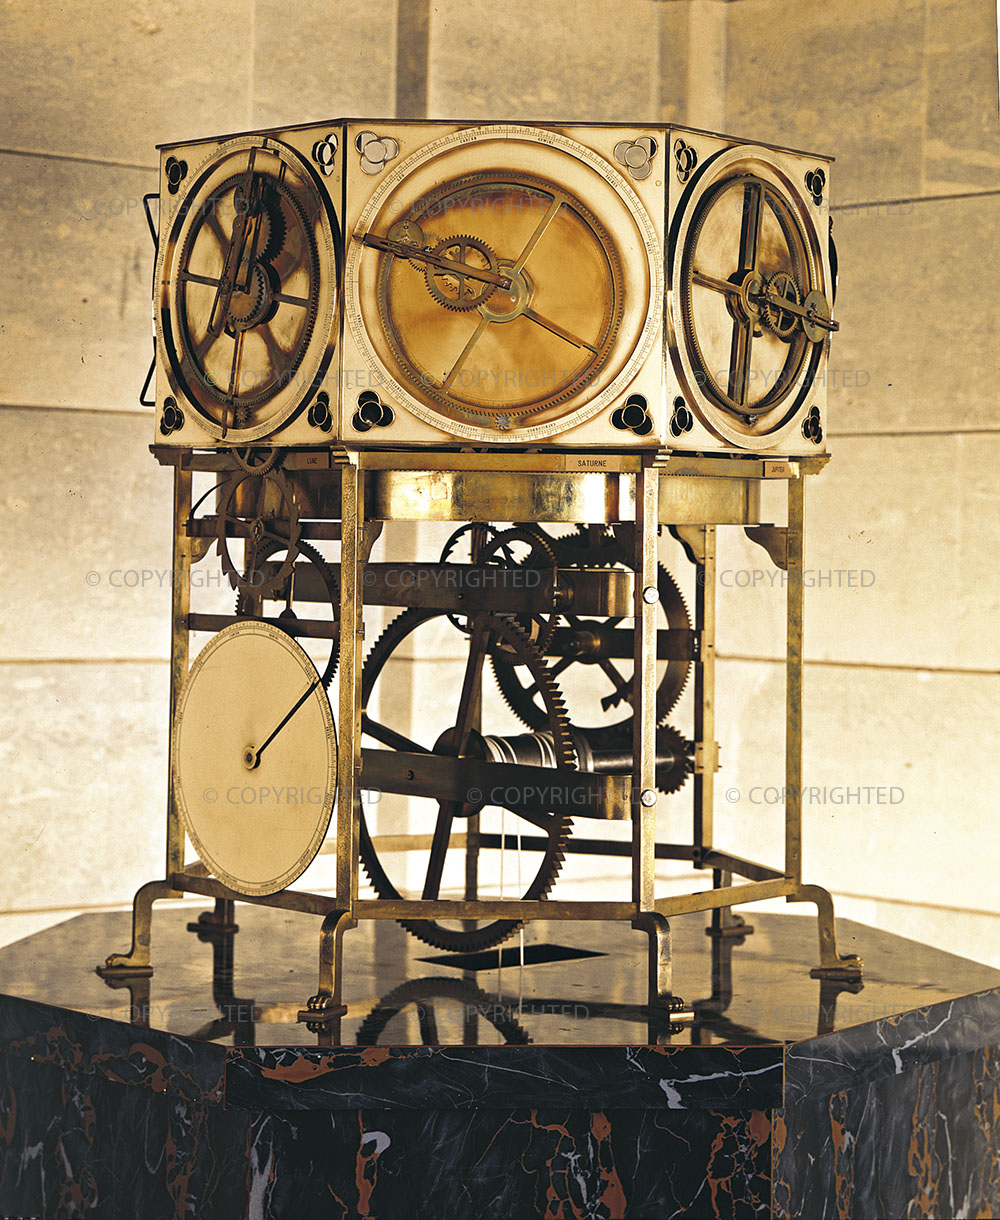 Giovanni de' Dondi's astrarium - Working model